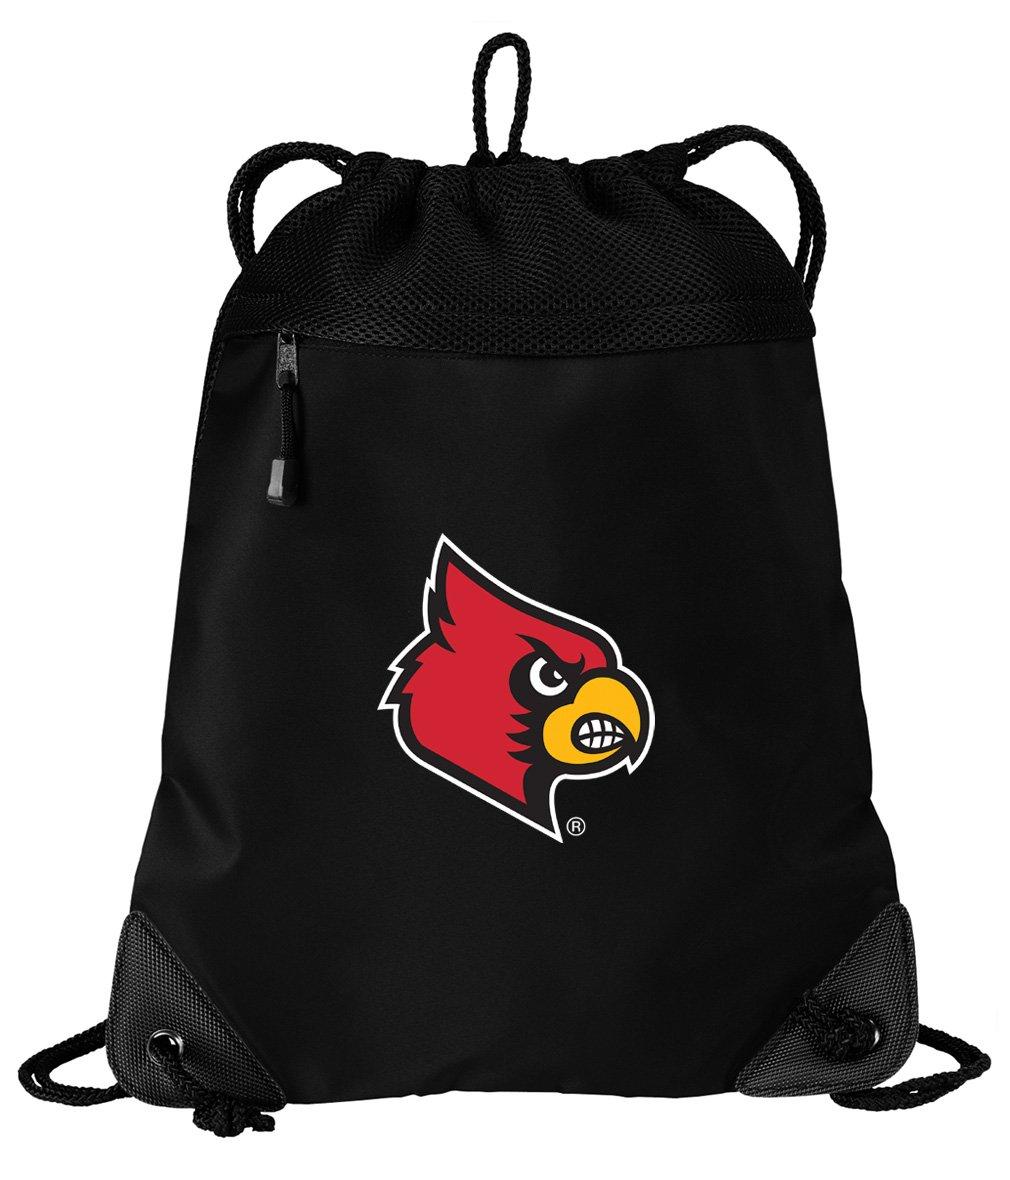 Broad Bay Louisville Cardinals Drawstring Bag University of Louisville Cinch Pack Backpack UNIQUE MESH & MICROFIBER